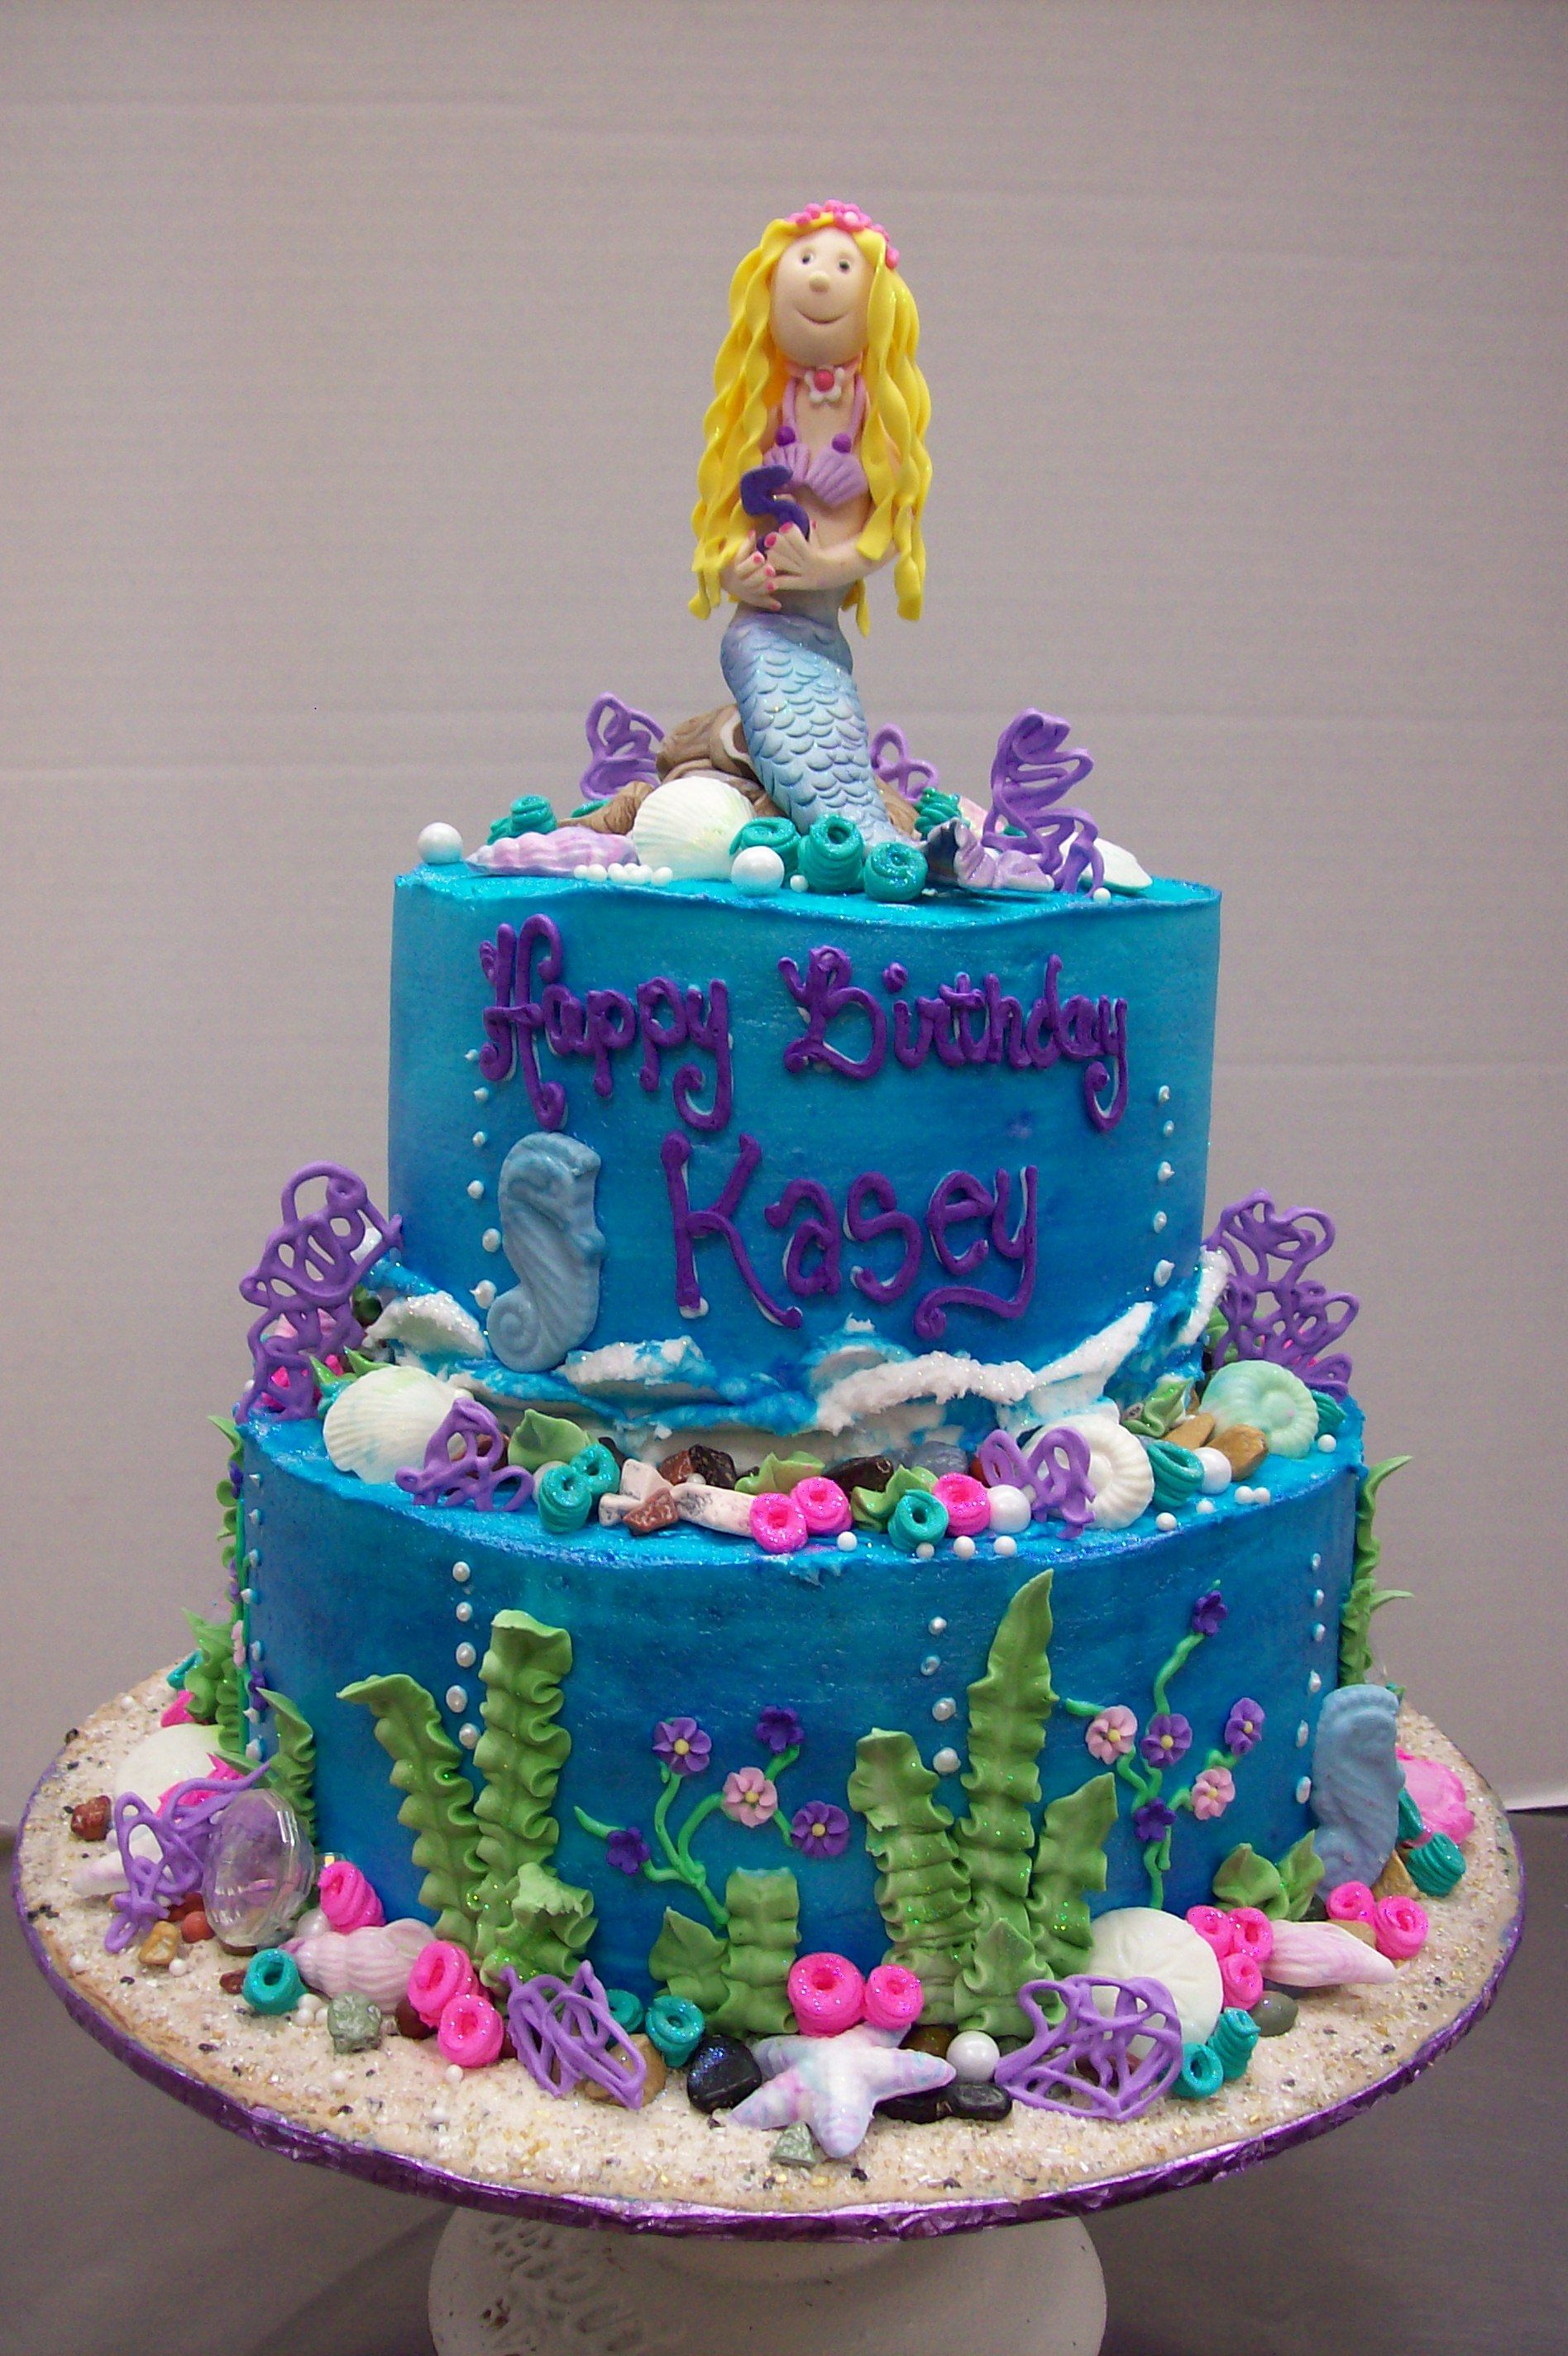 Rolled fondant mermaid birthday cake Fun with Fondant icing